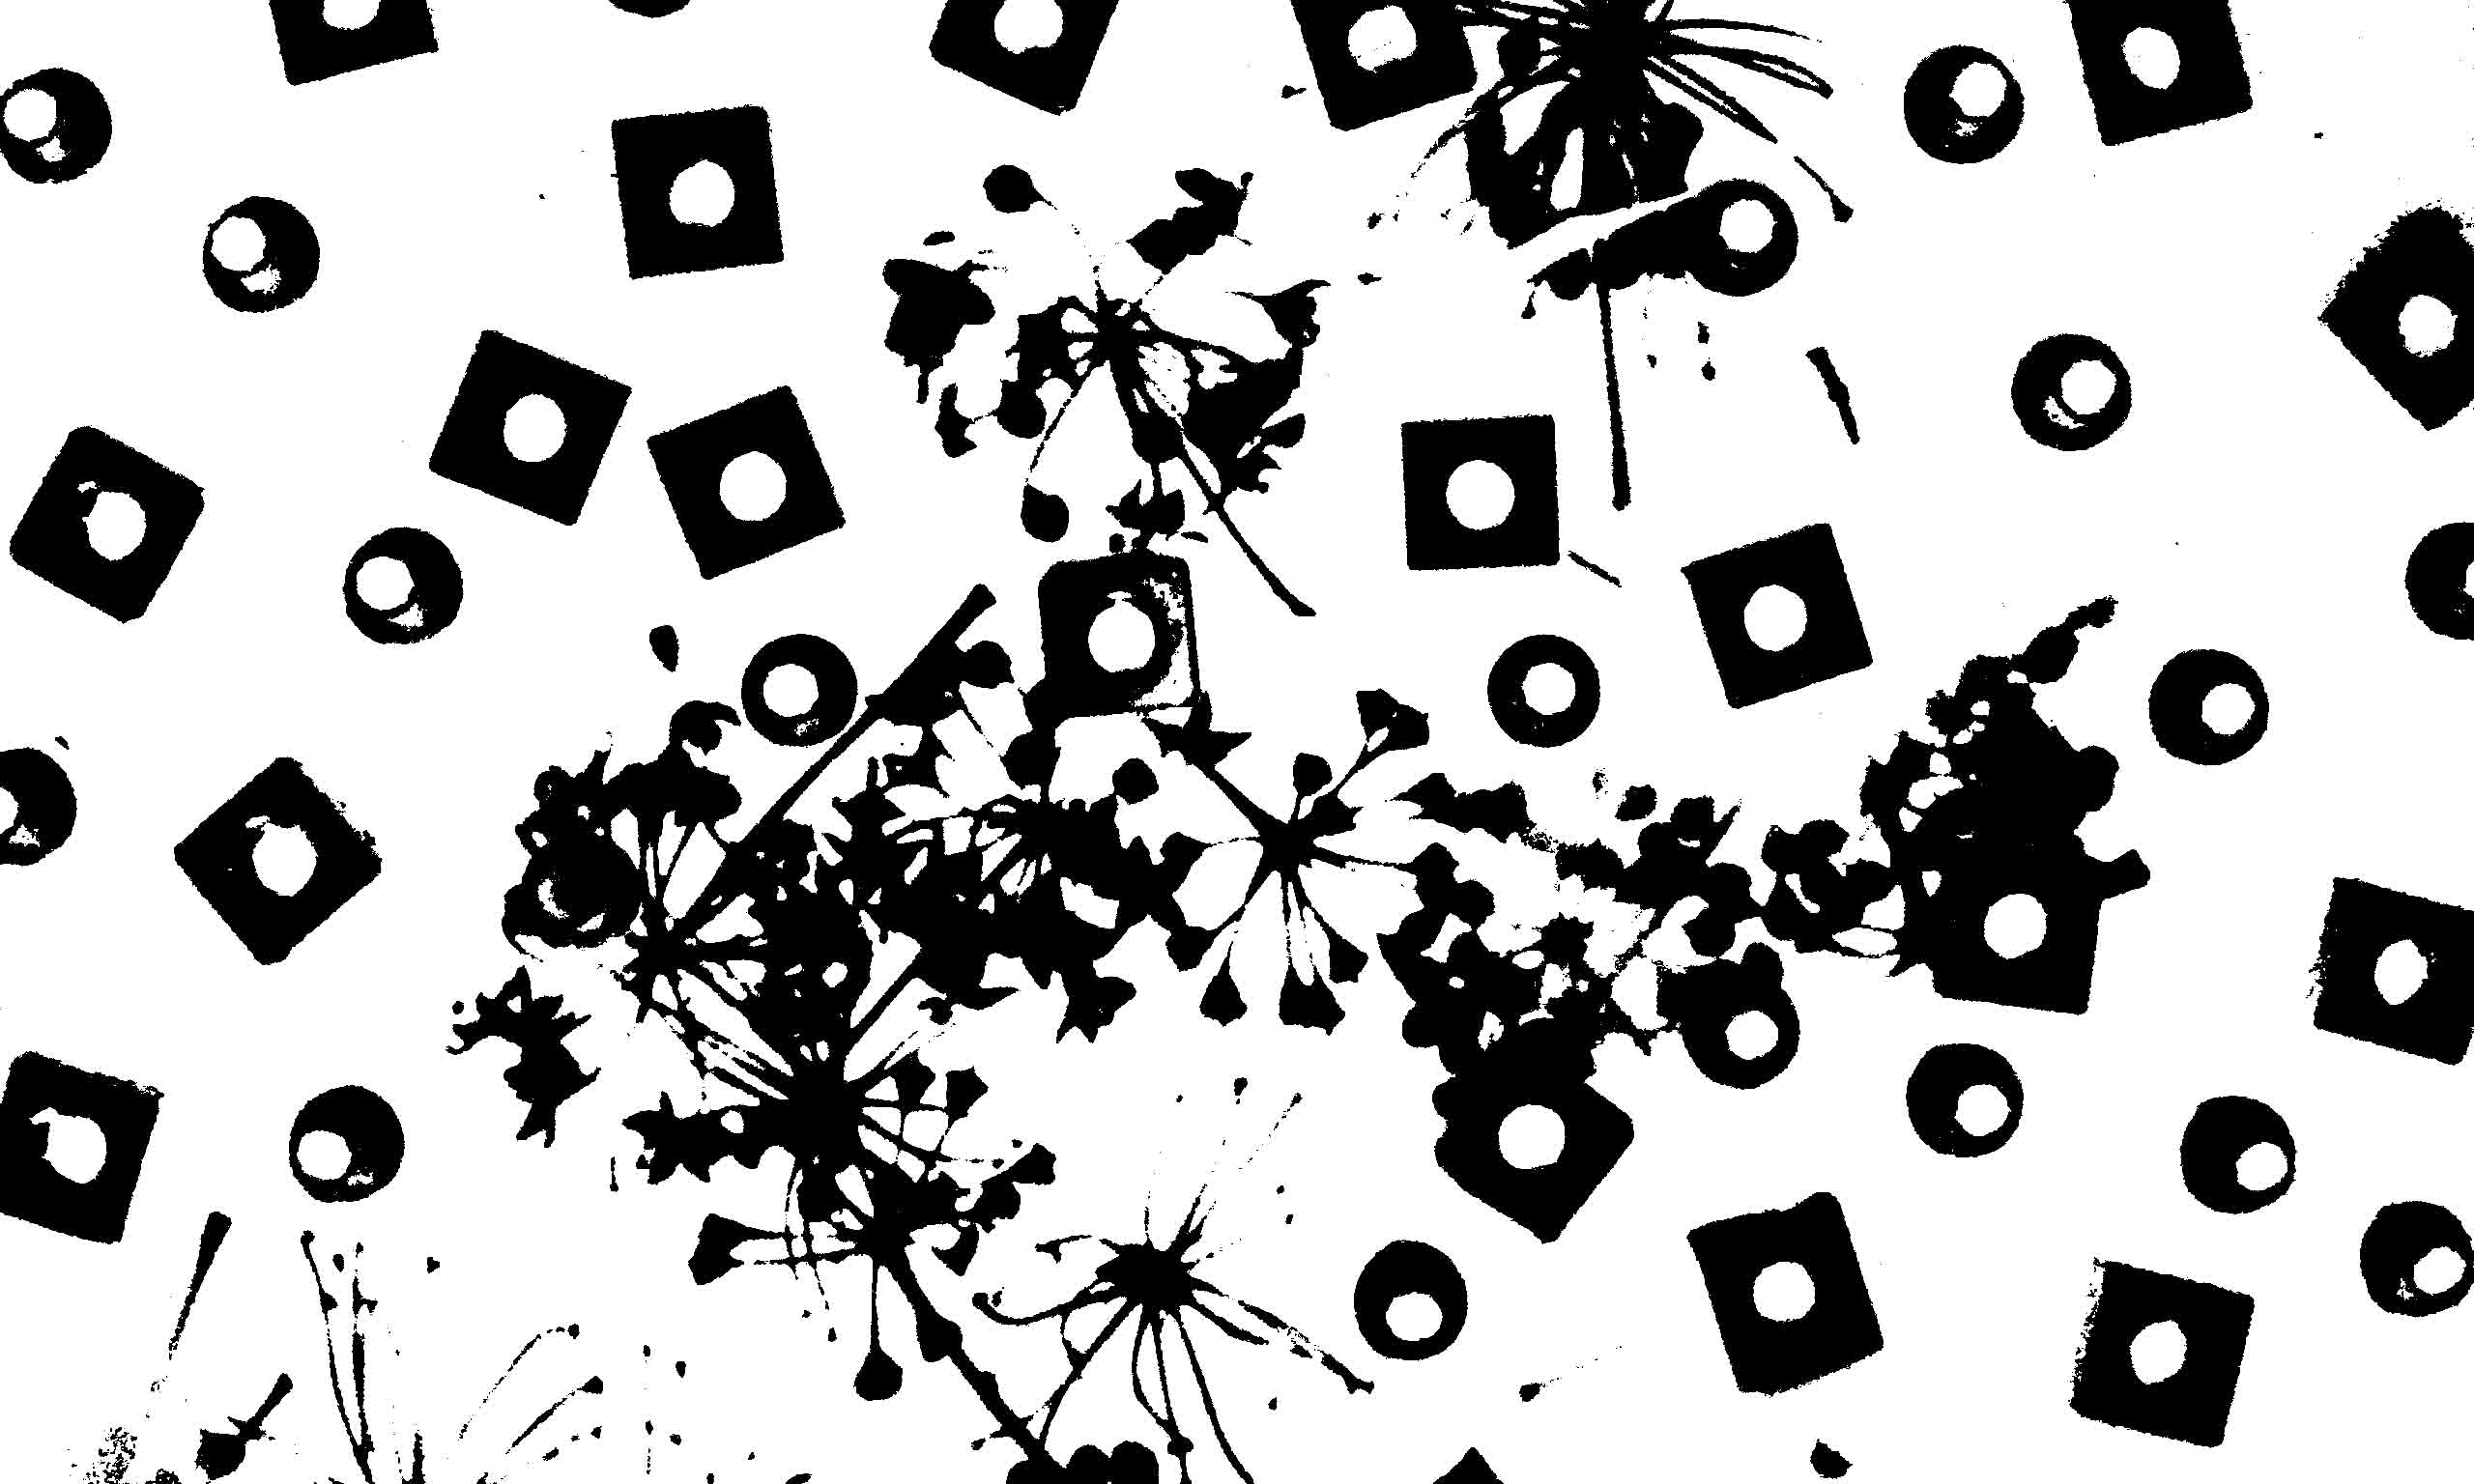 20171020_102123a Abstract FBO